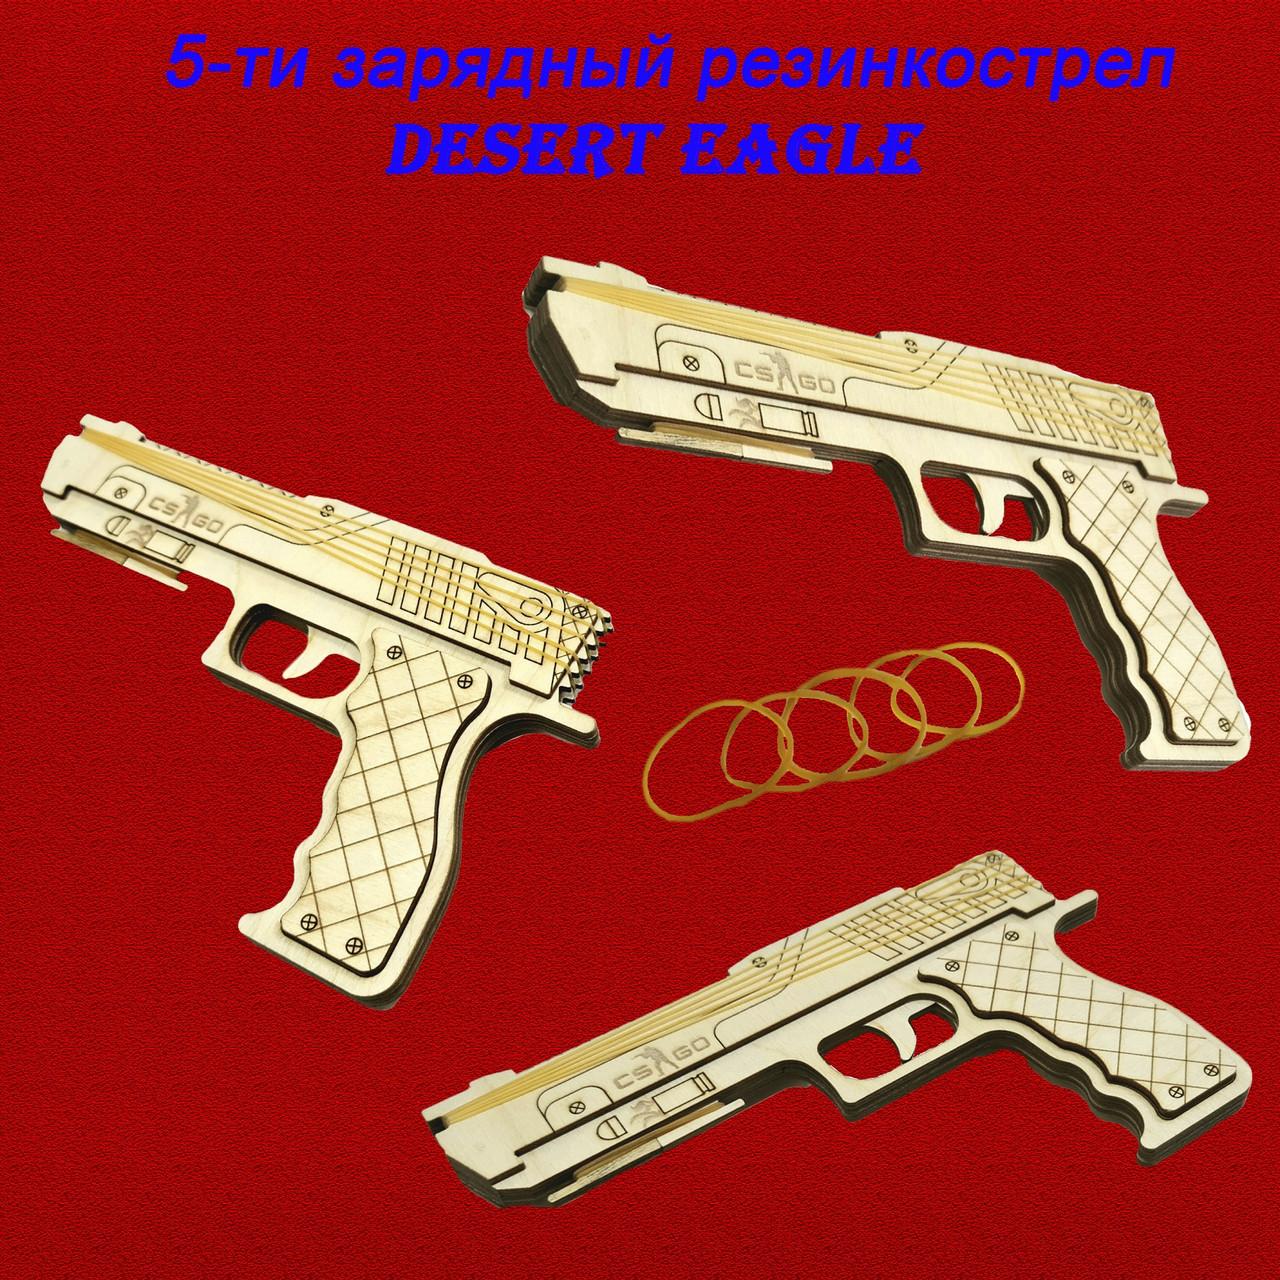 Пистолет резинкострел Дезерт Игл Desert Eagle CS GO  оружие детские игрушки из дерева подарки